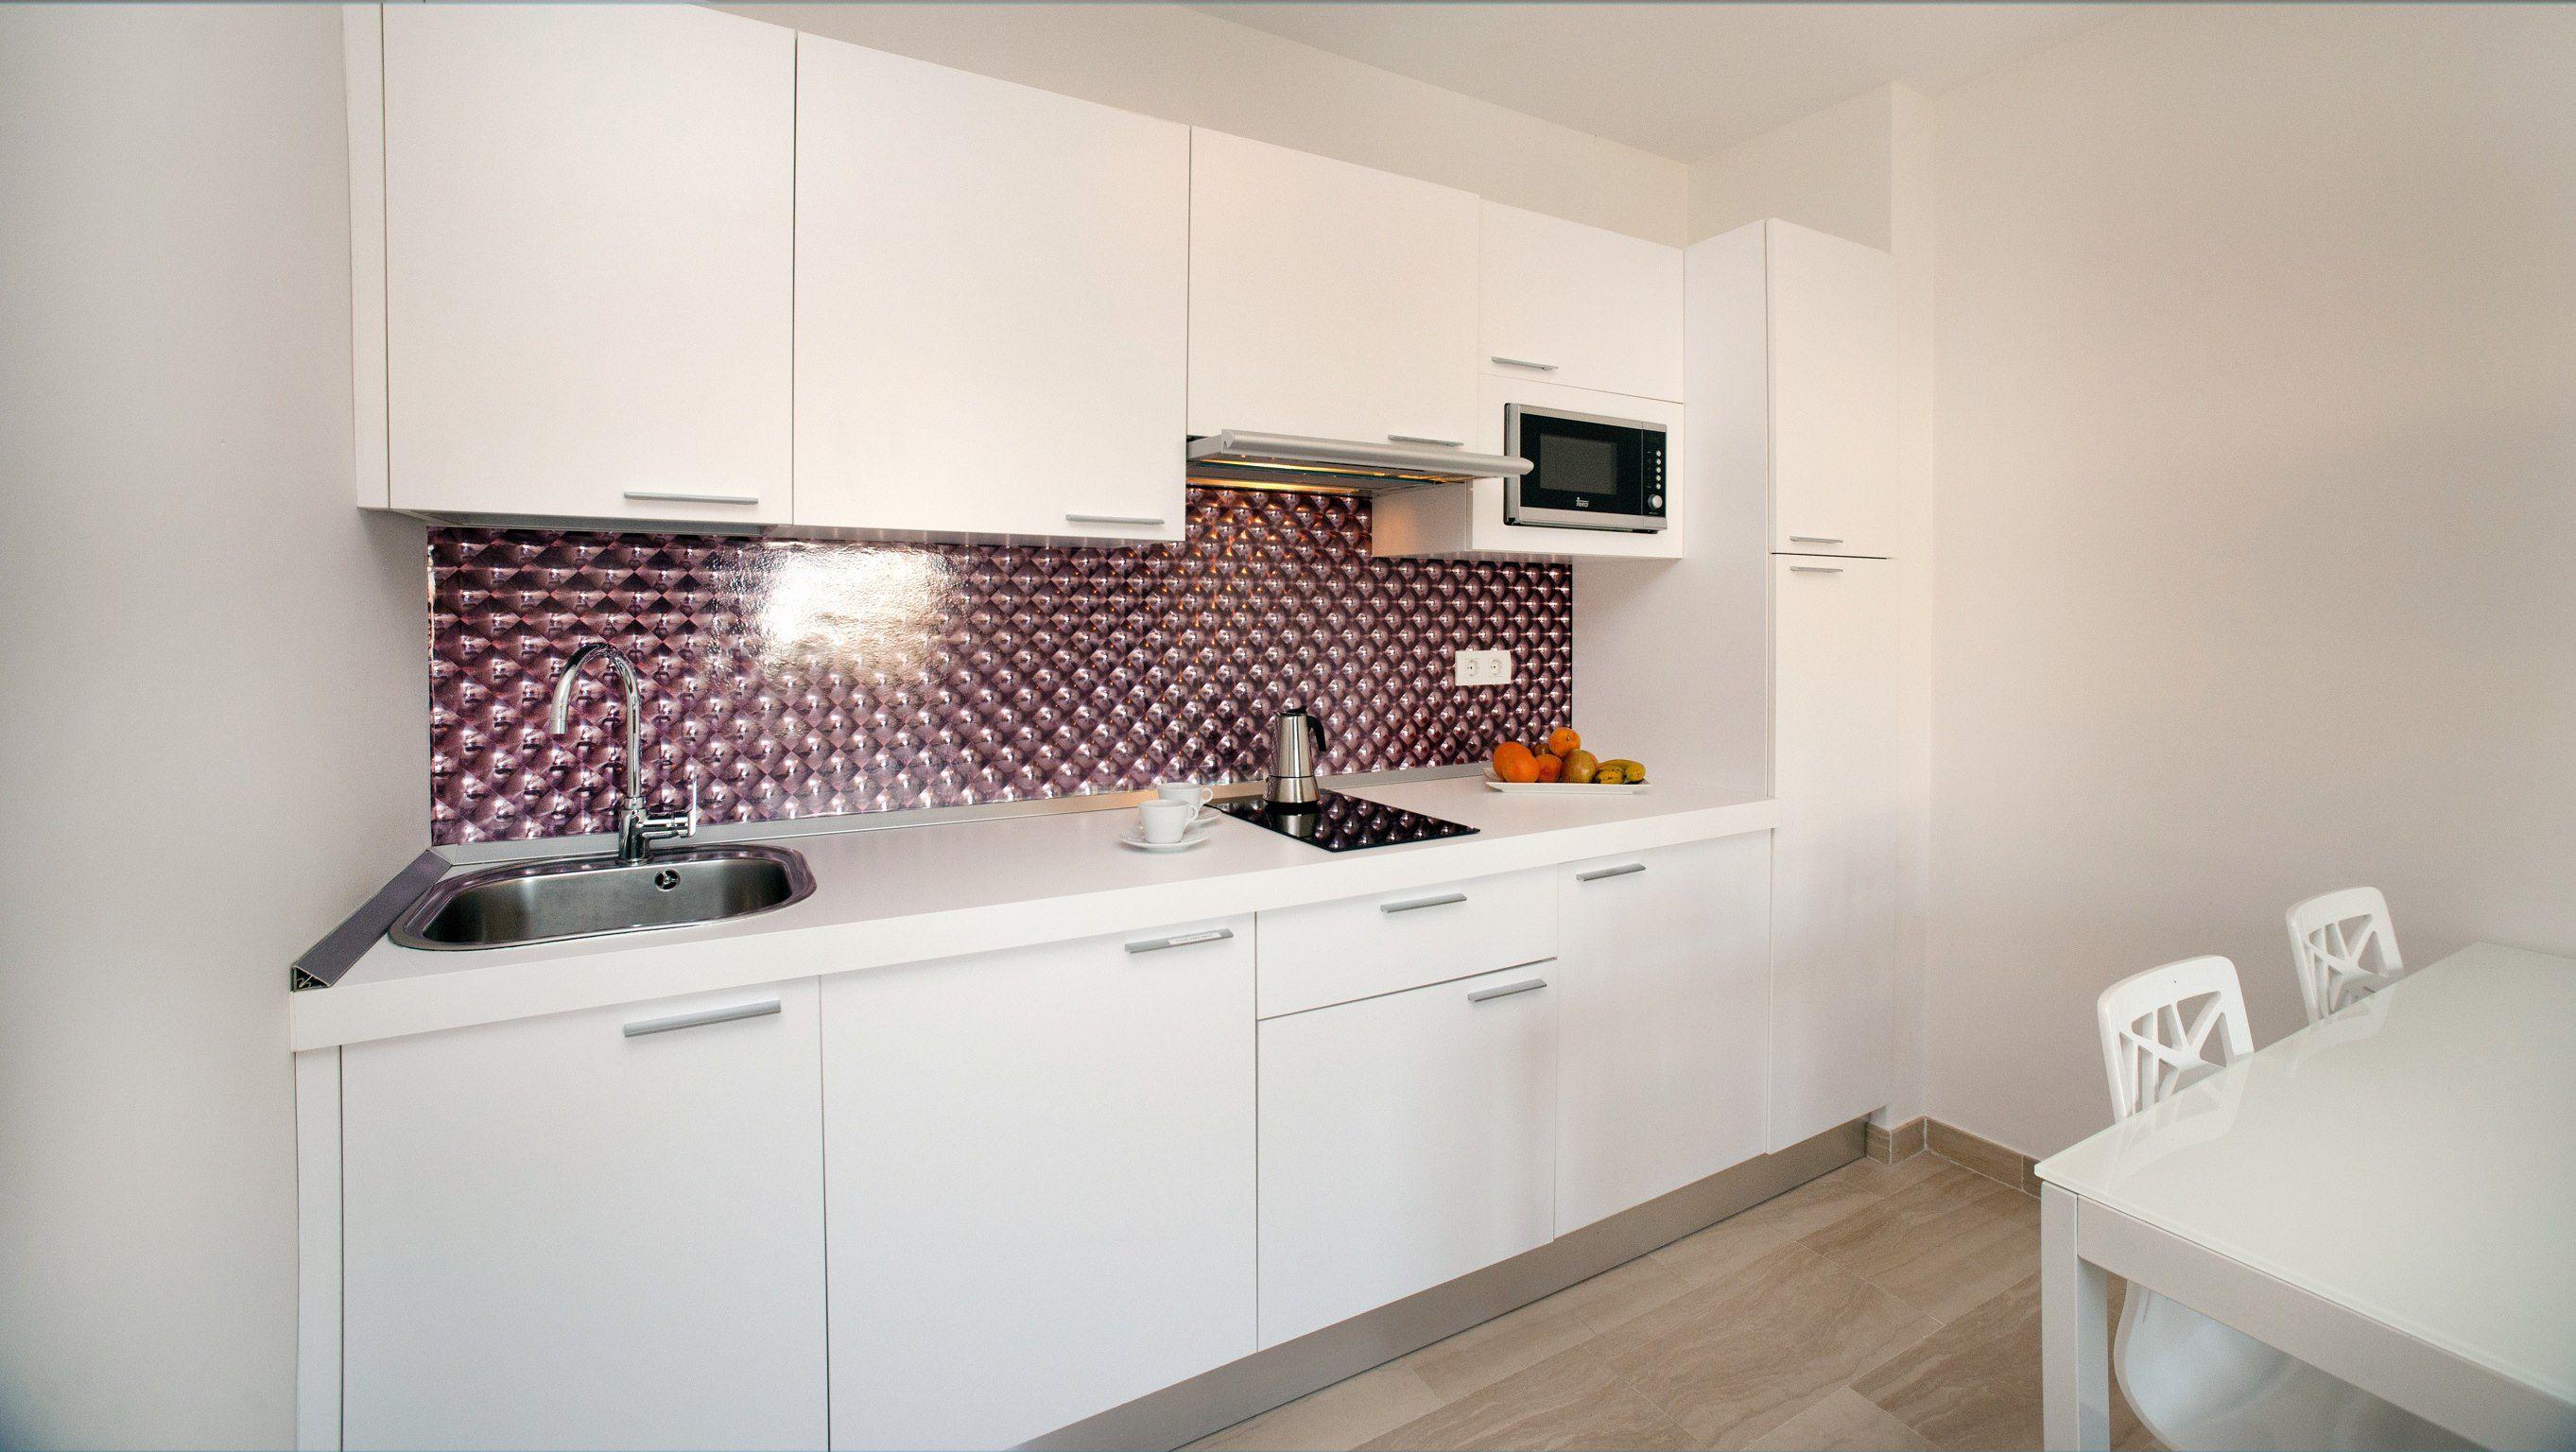 Apartamento 1 dormitorio Superior del hotel Leo Canela. Foto 2